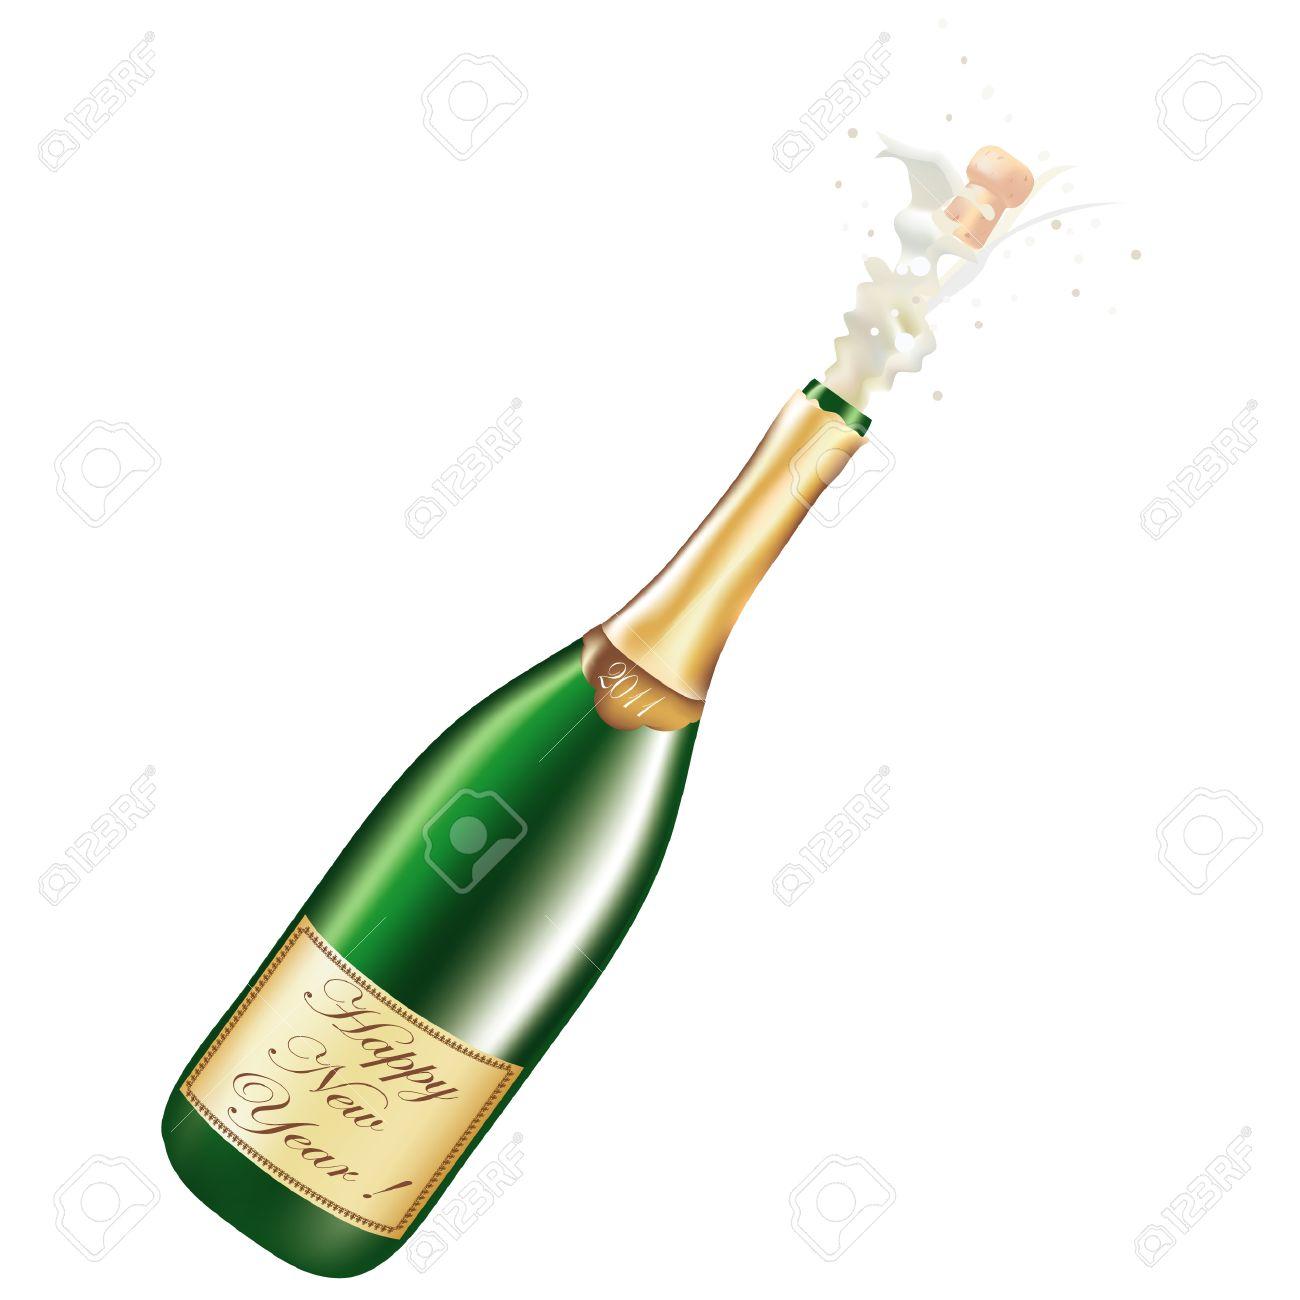 Champagne bottle clipart 6 » Clipart Station.